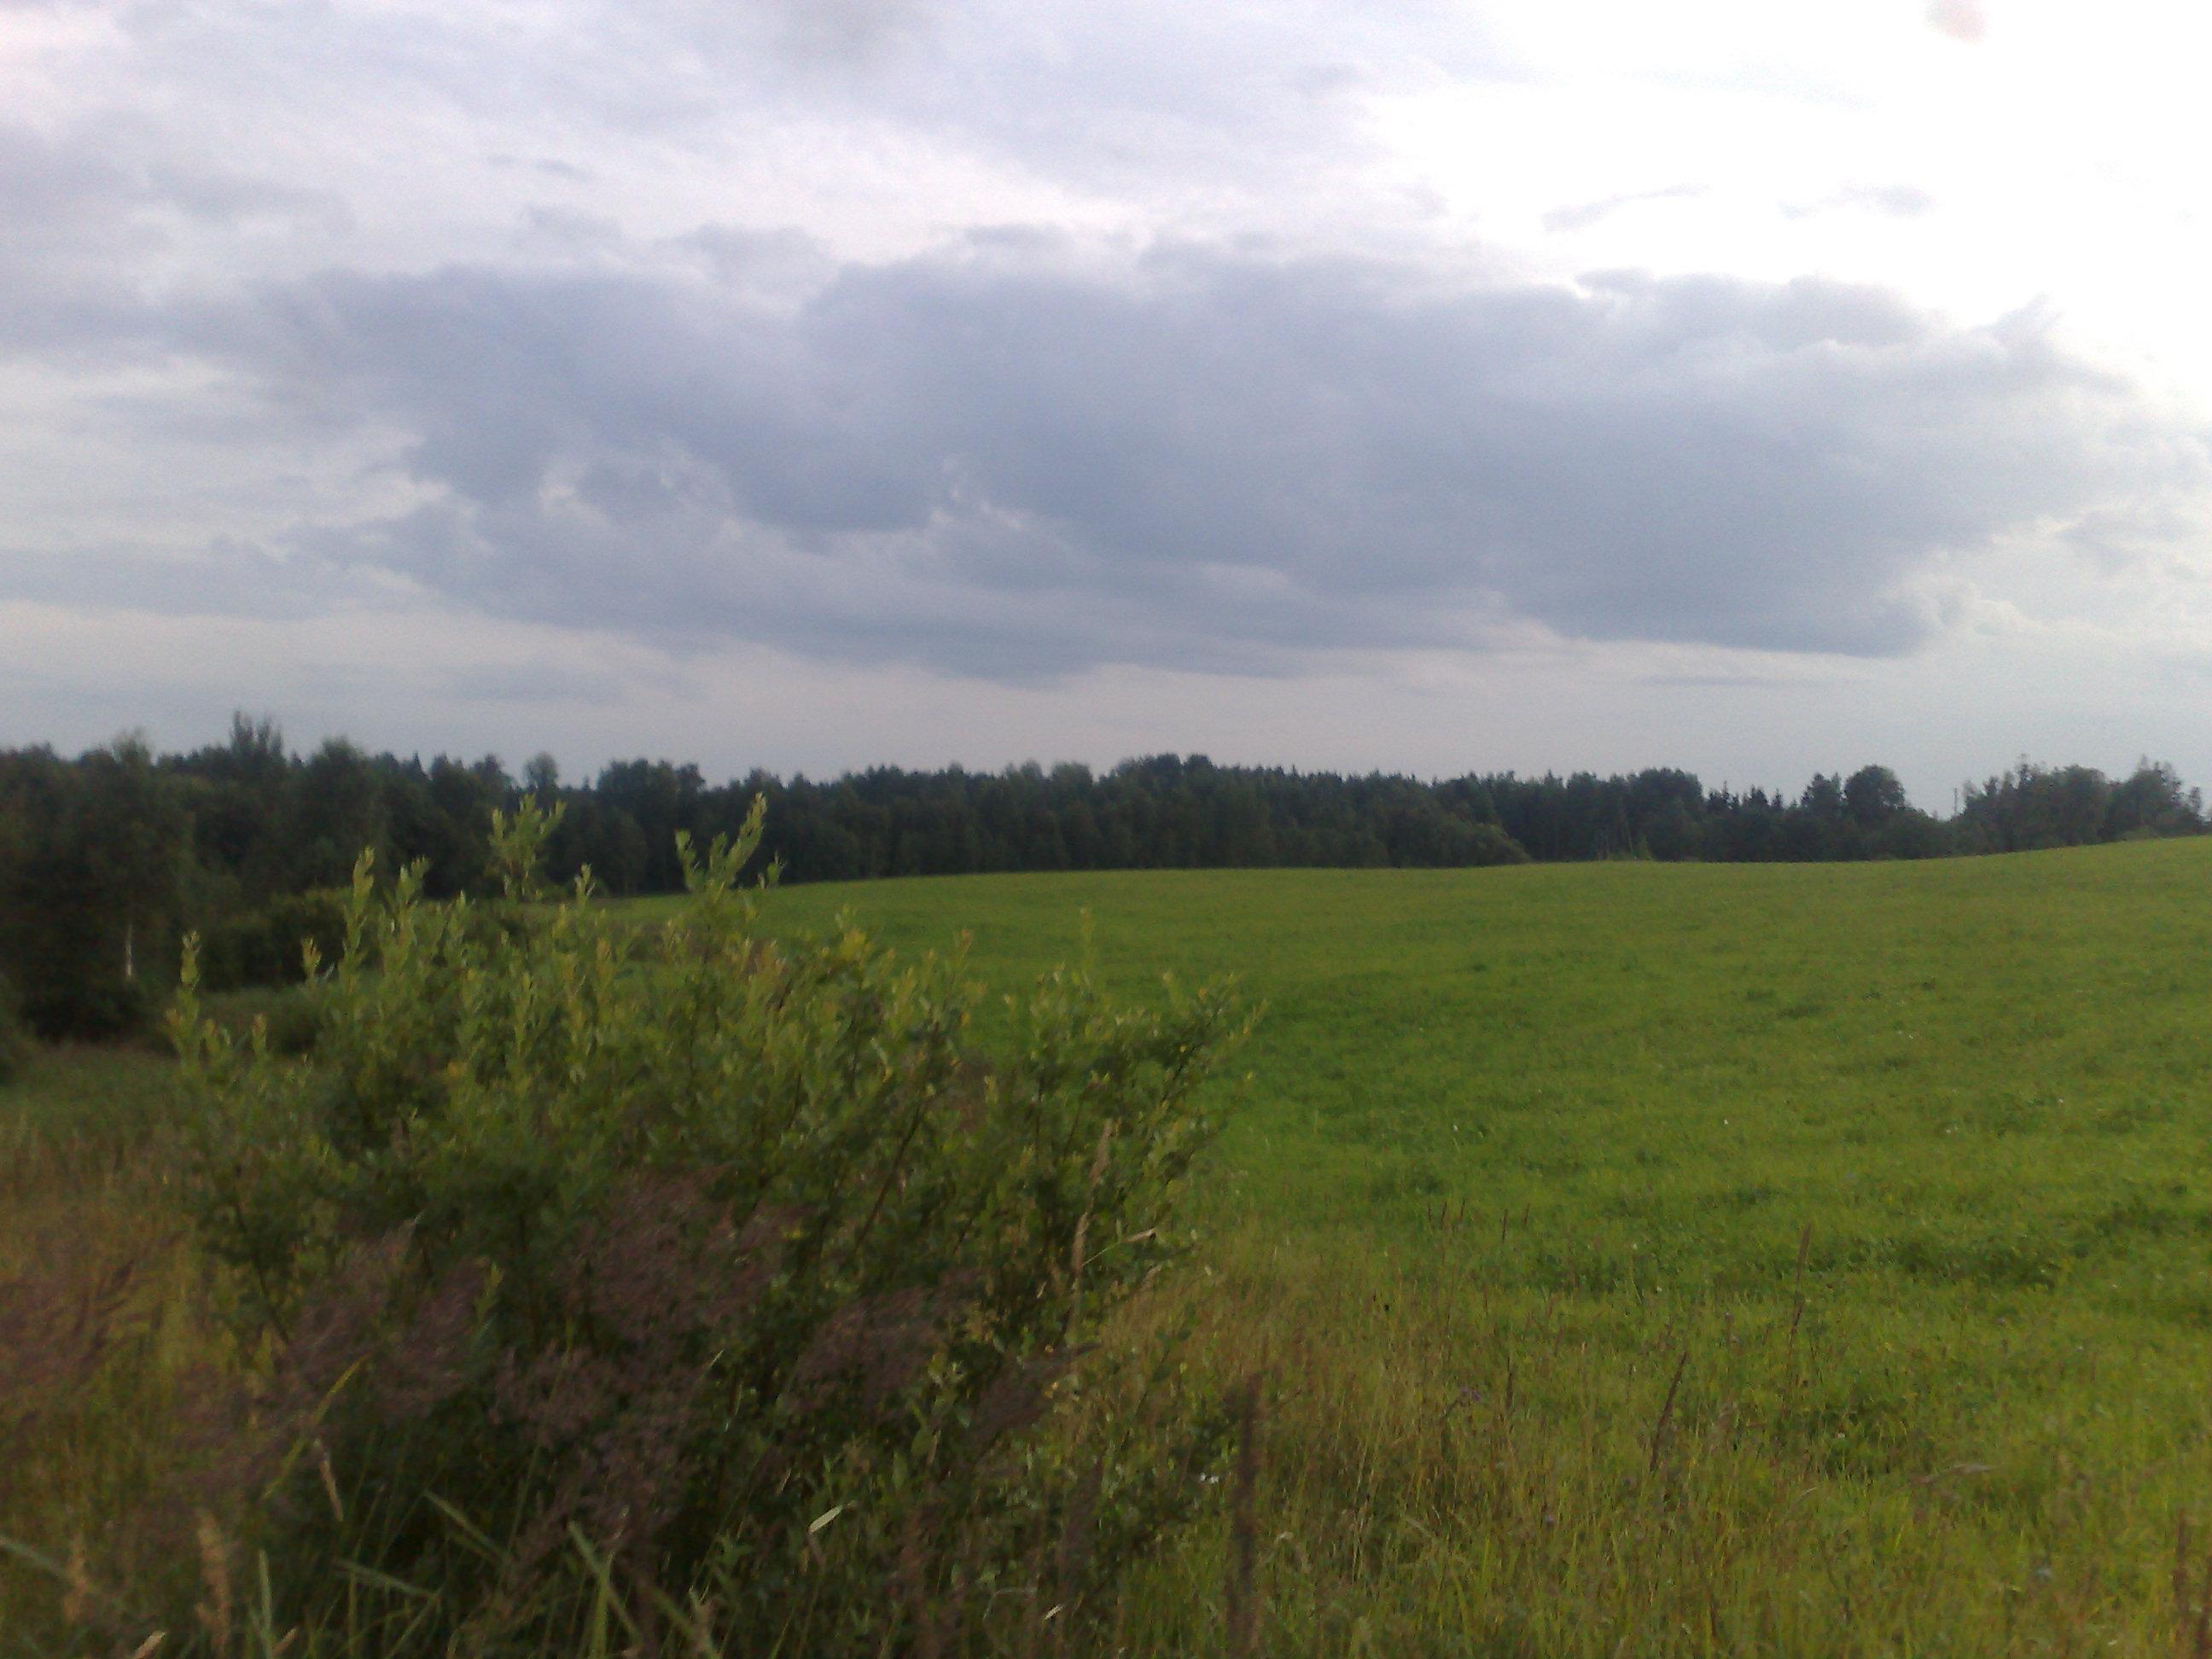 Vente terrain agricole vecpiebalga c sis lettonie for Agrandissement maison terrain agricole